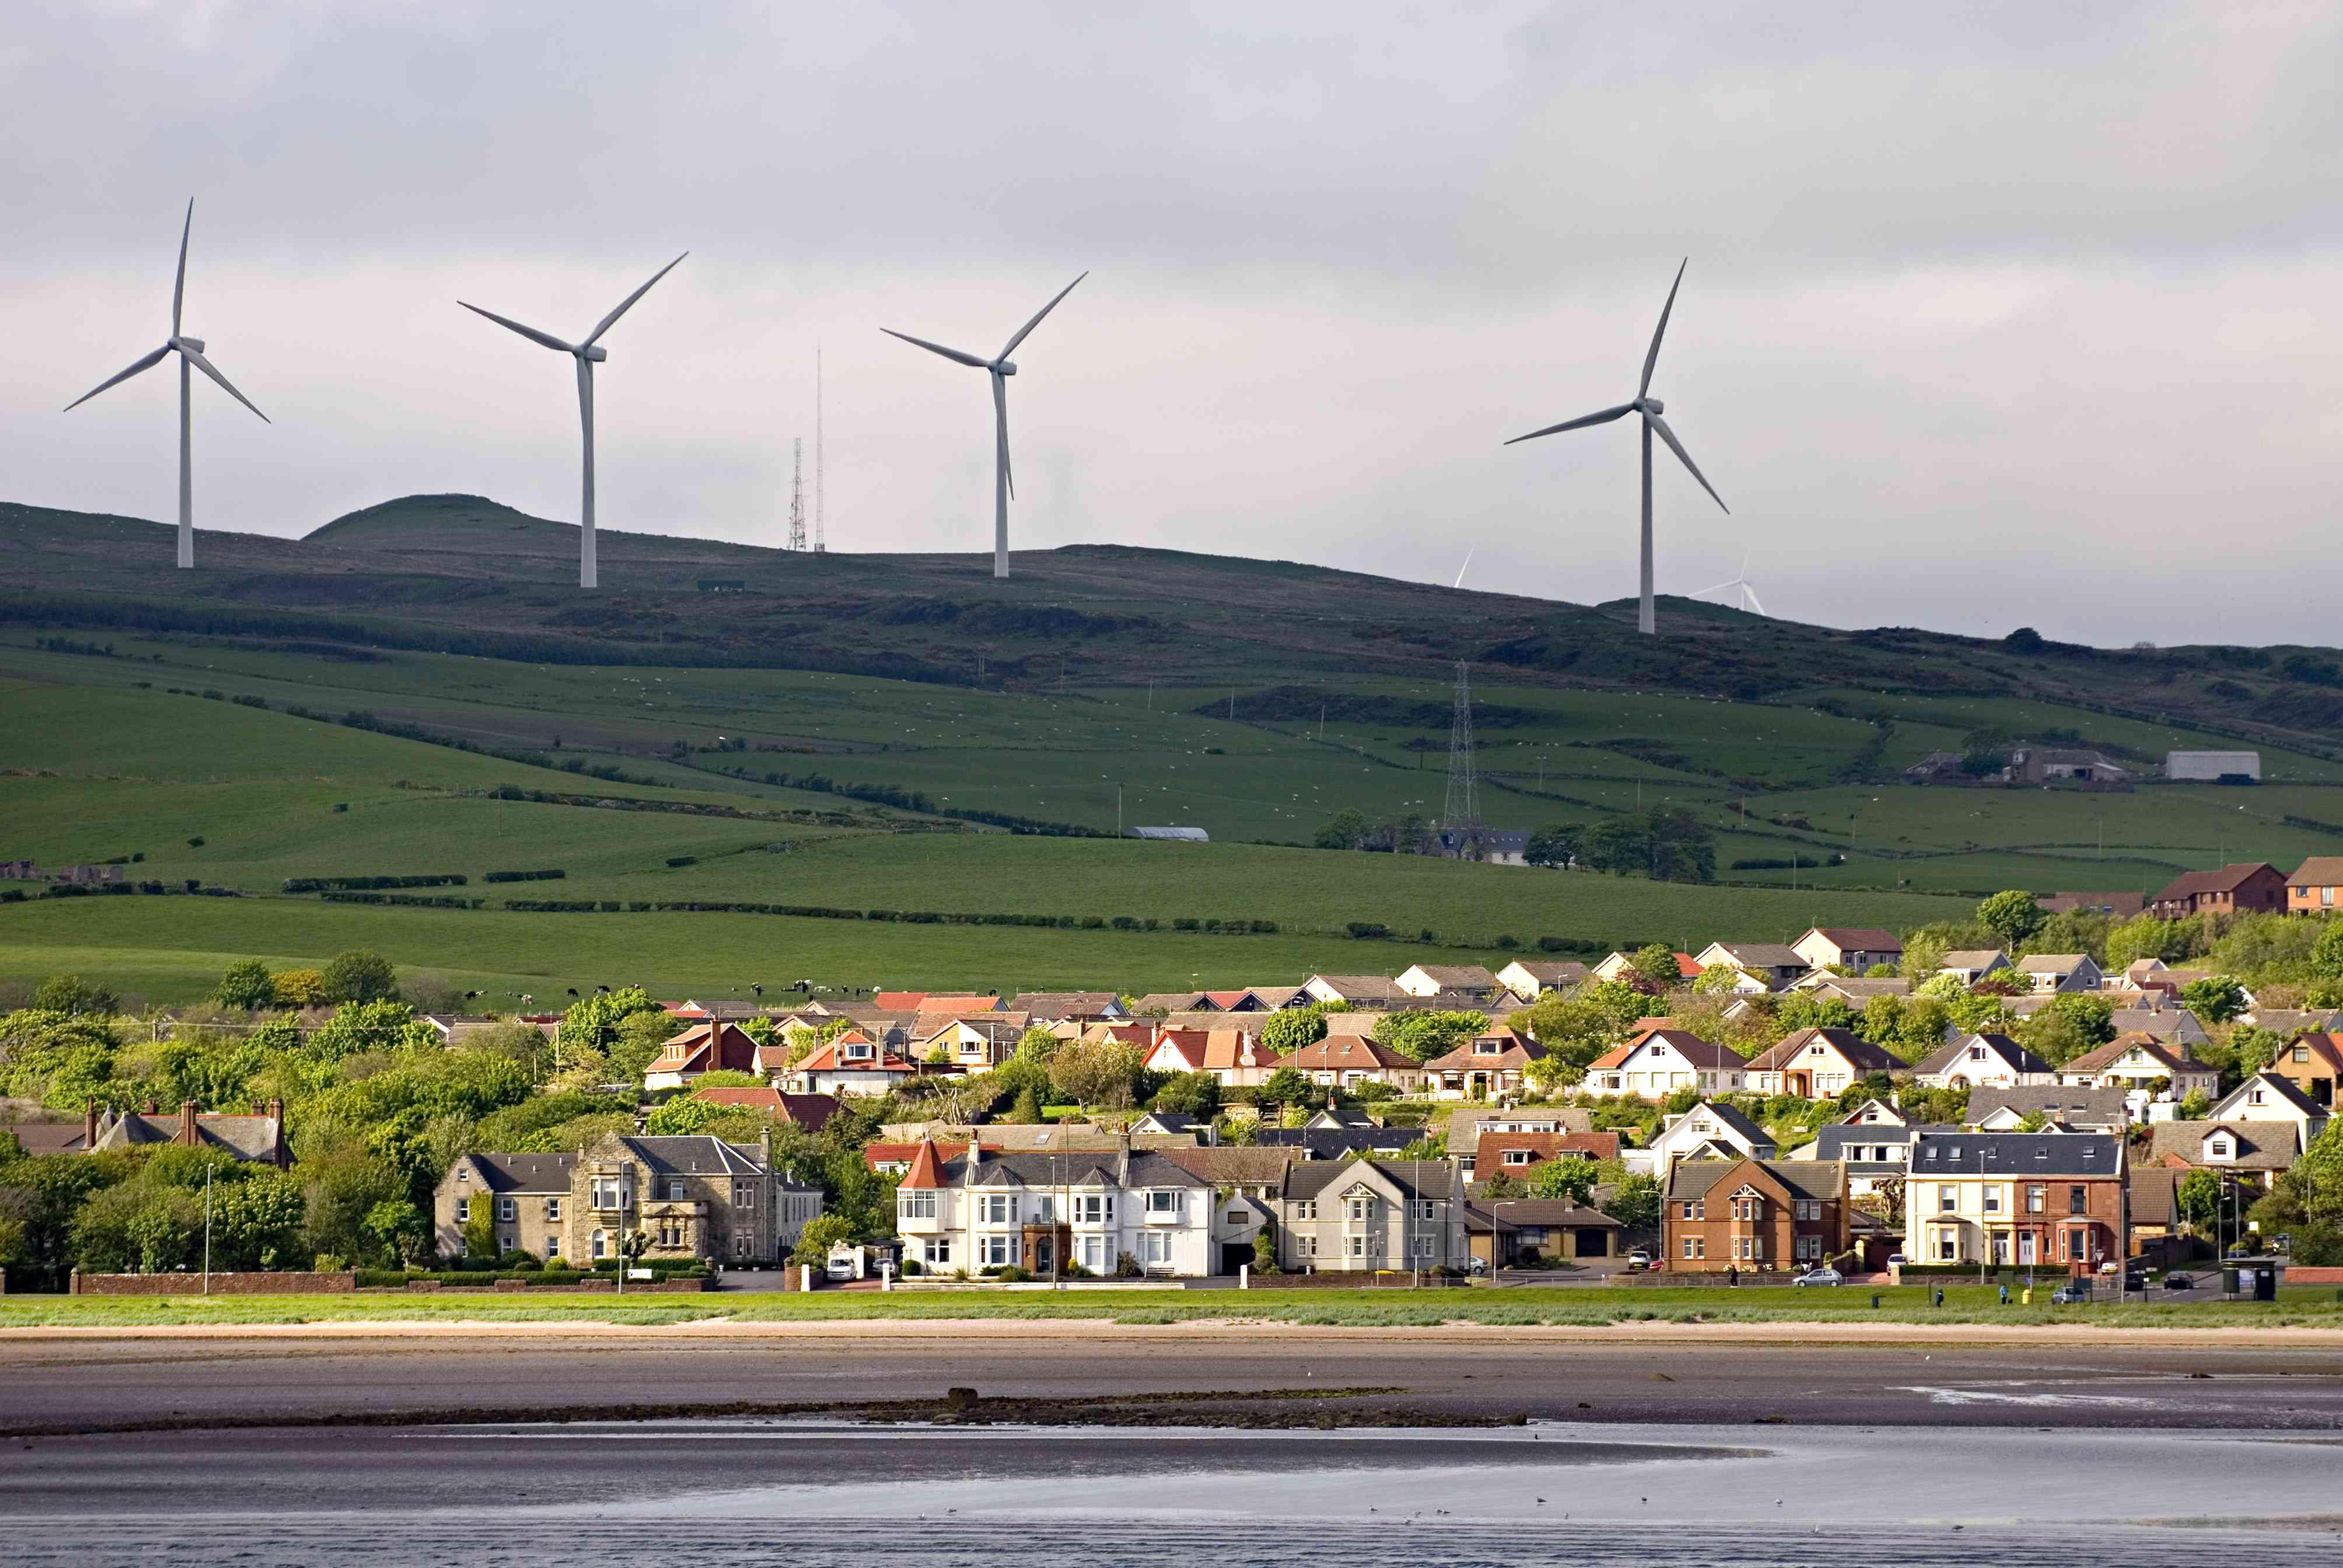 Wind farm near Ardrossan, Scotland